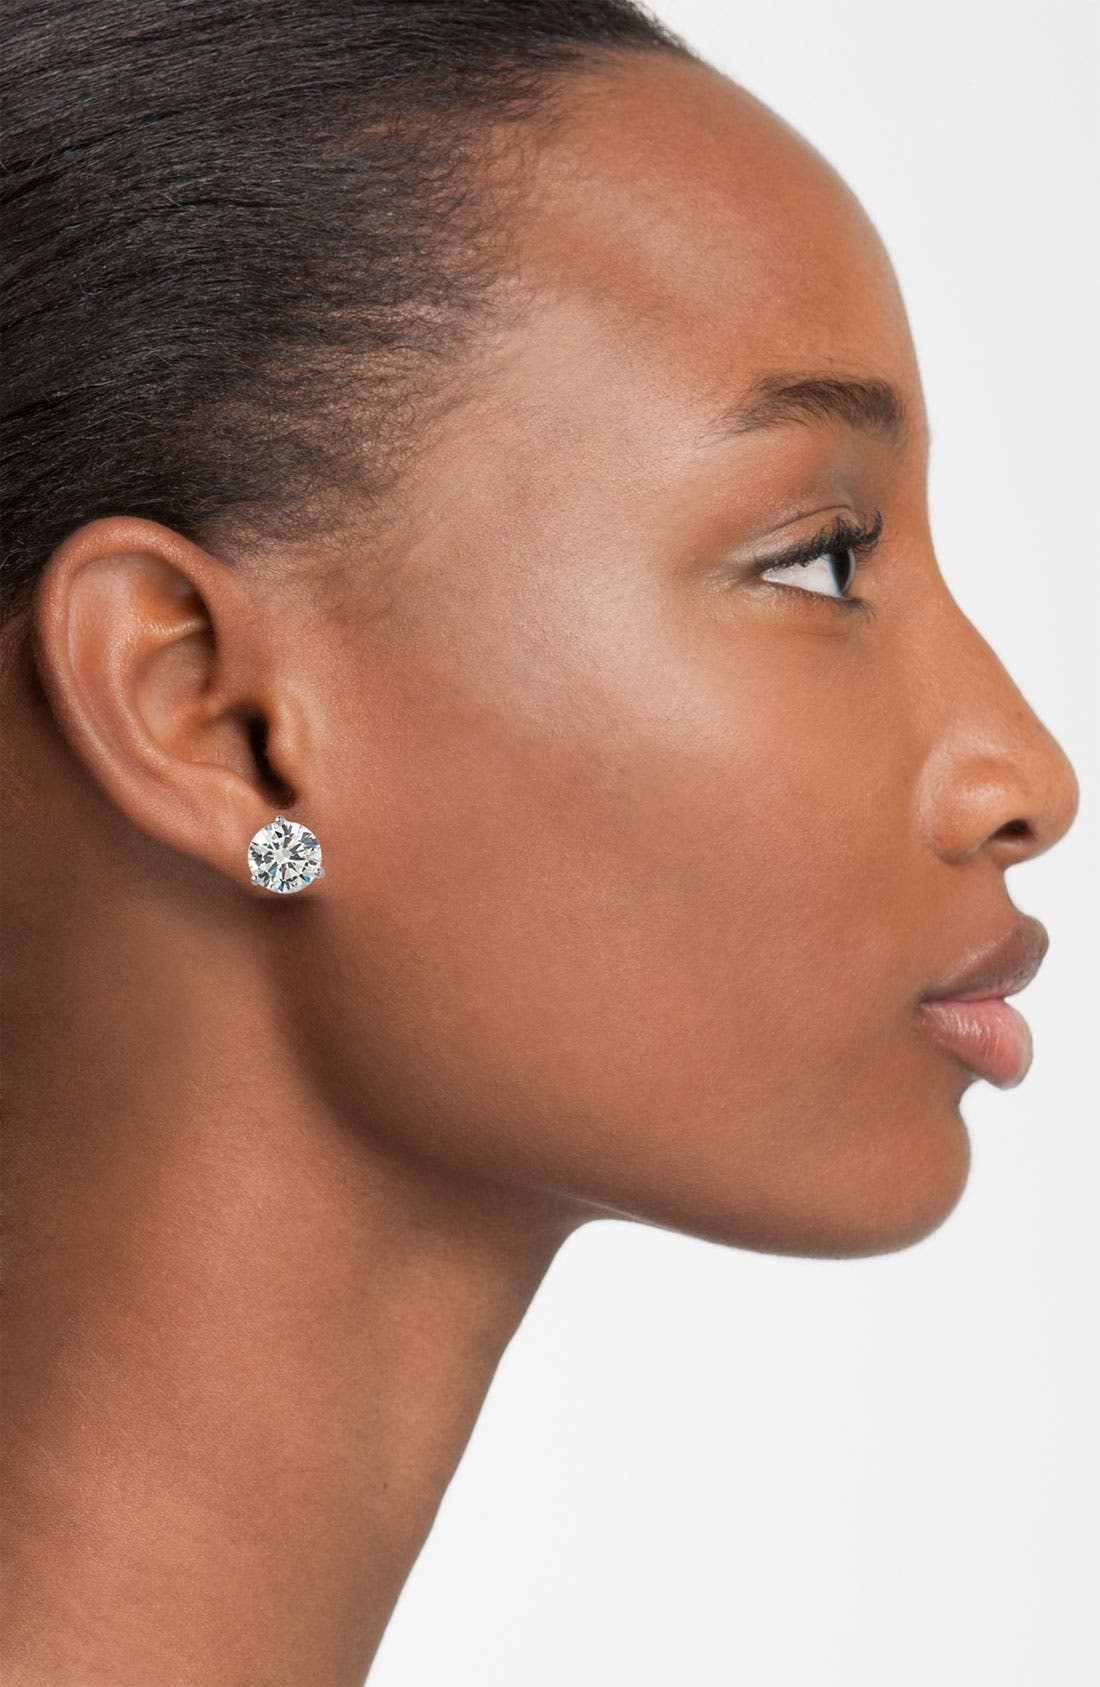 8.0ct tw Cubic Zirconia Earrings,                             Alternate thumbnail 7, color,                             PLATINUM